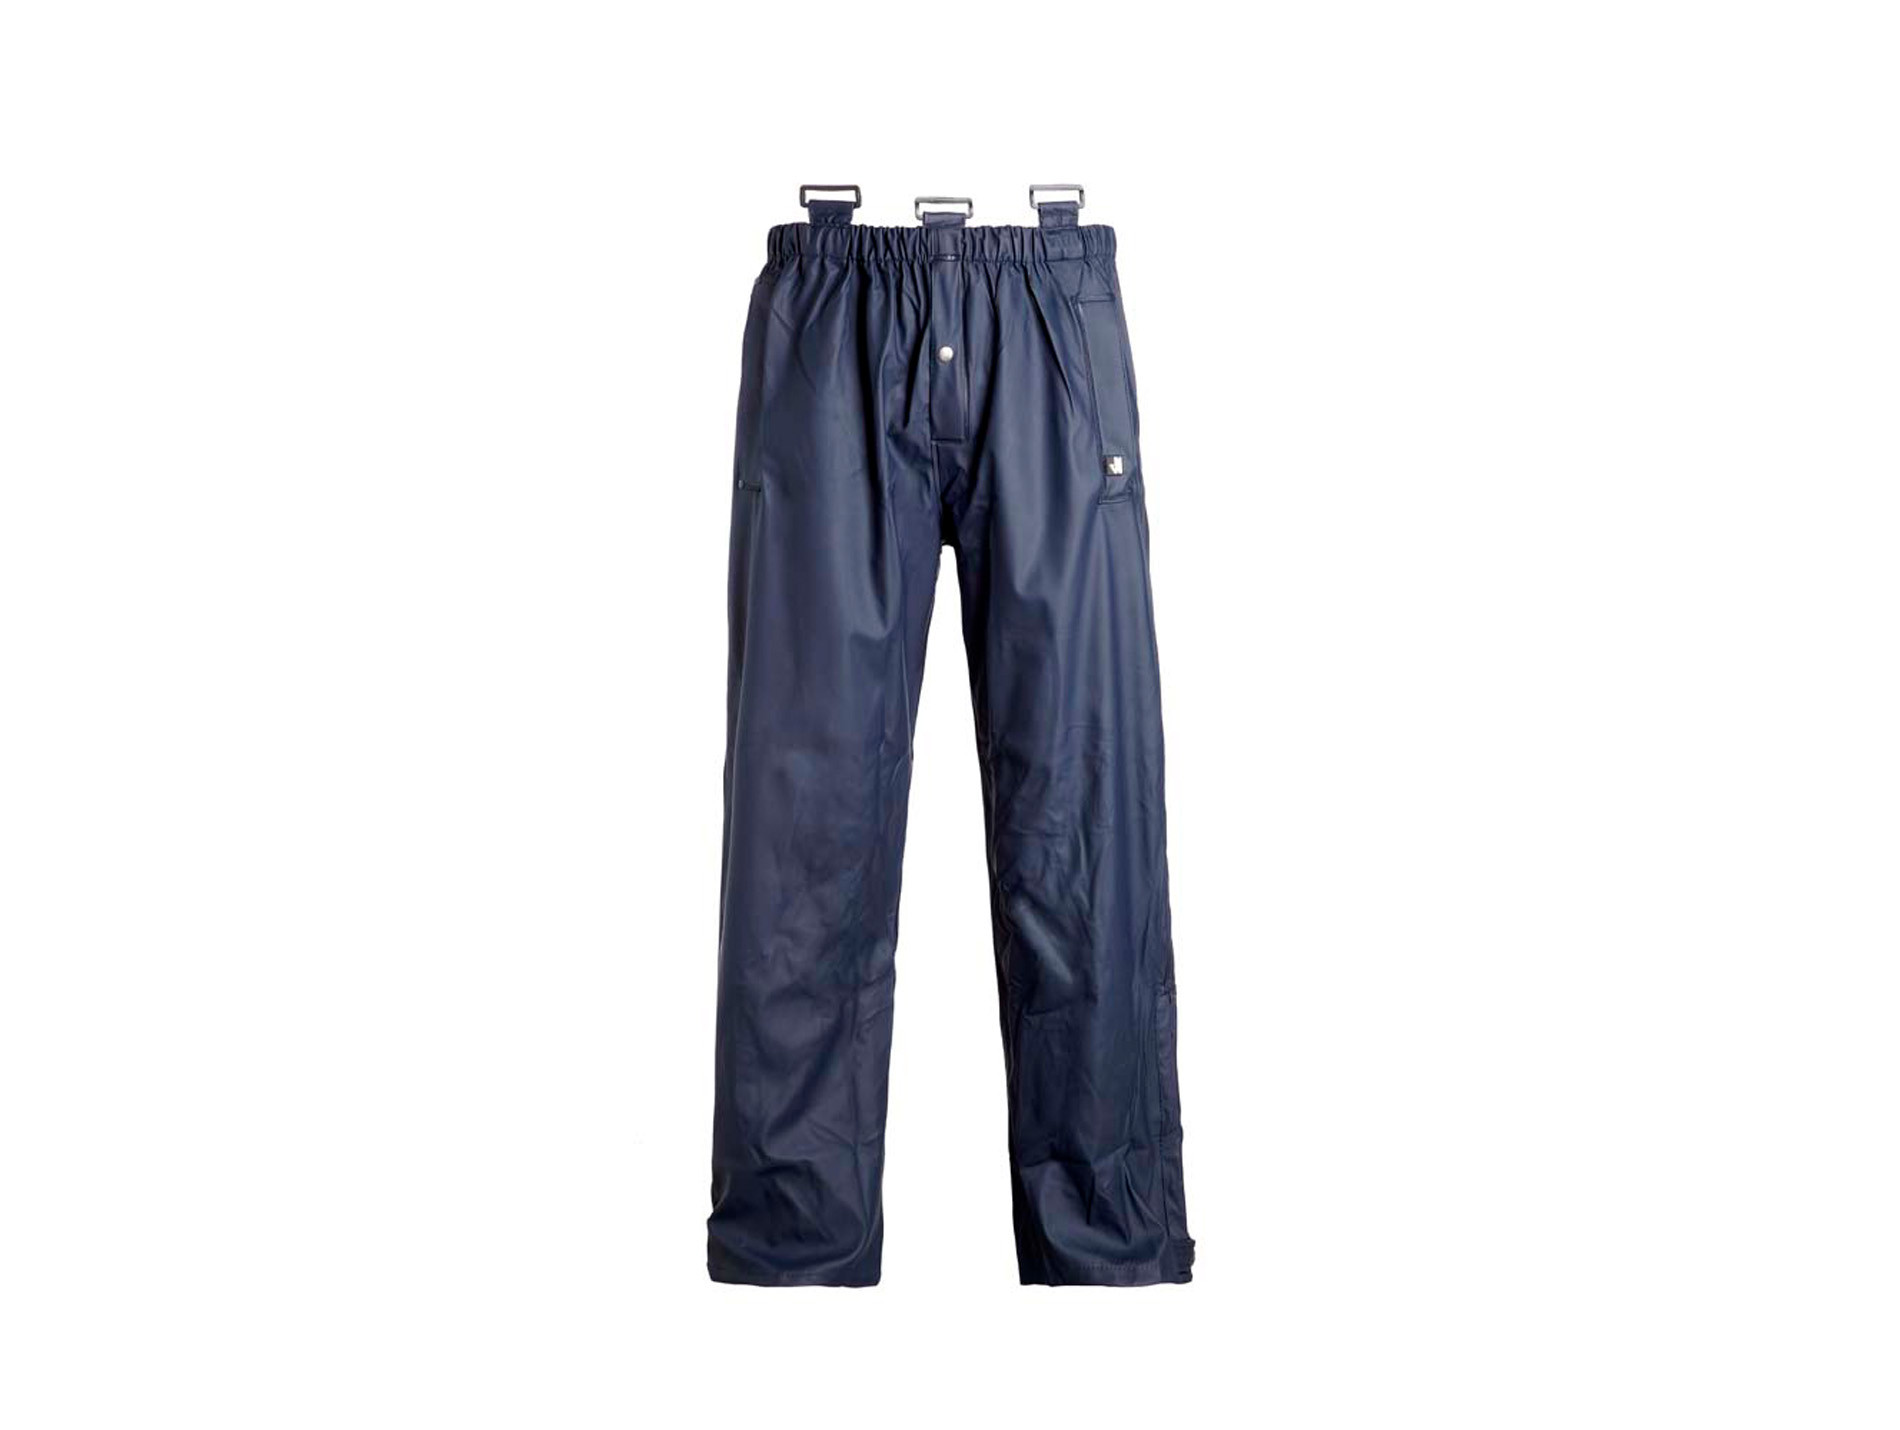 Pantalon de pluie Shark marine